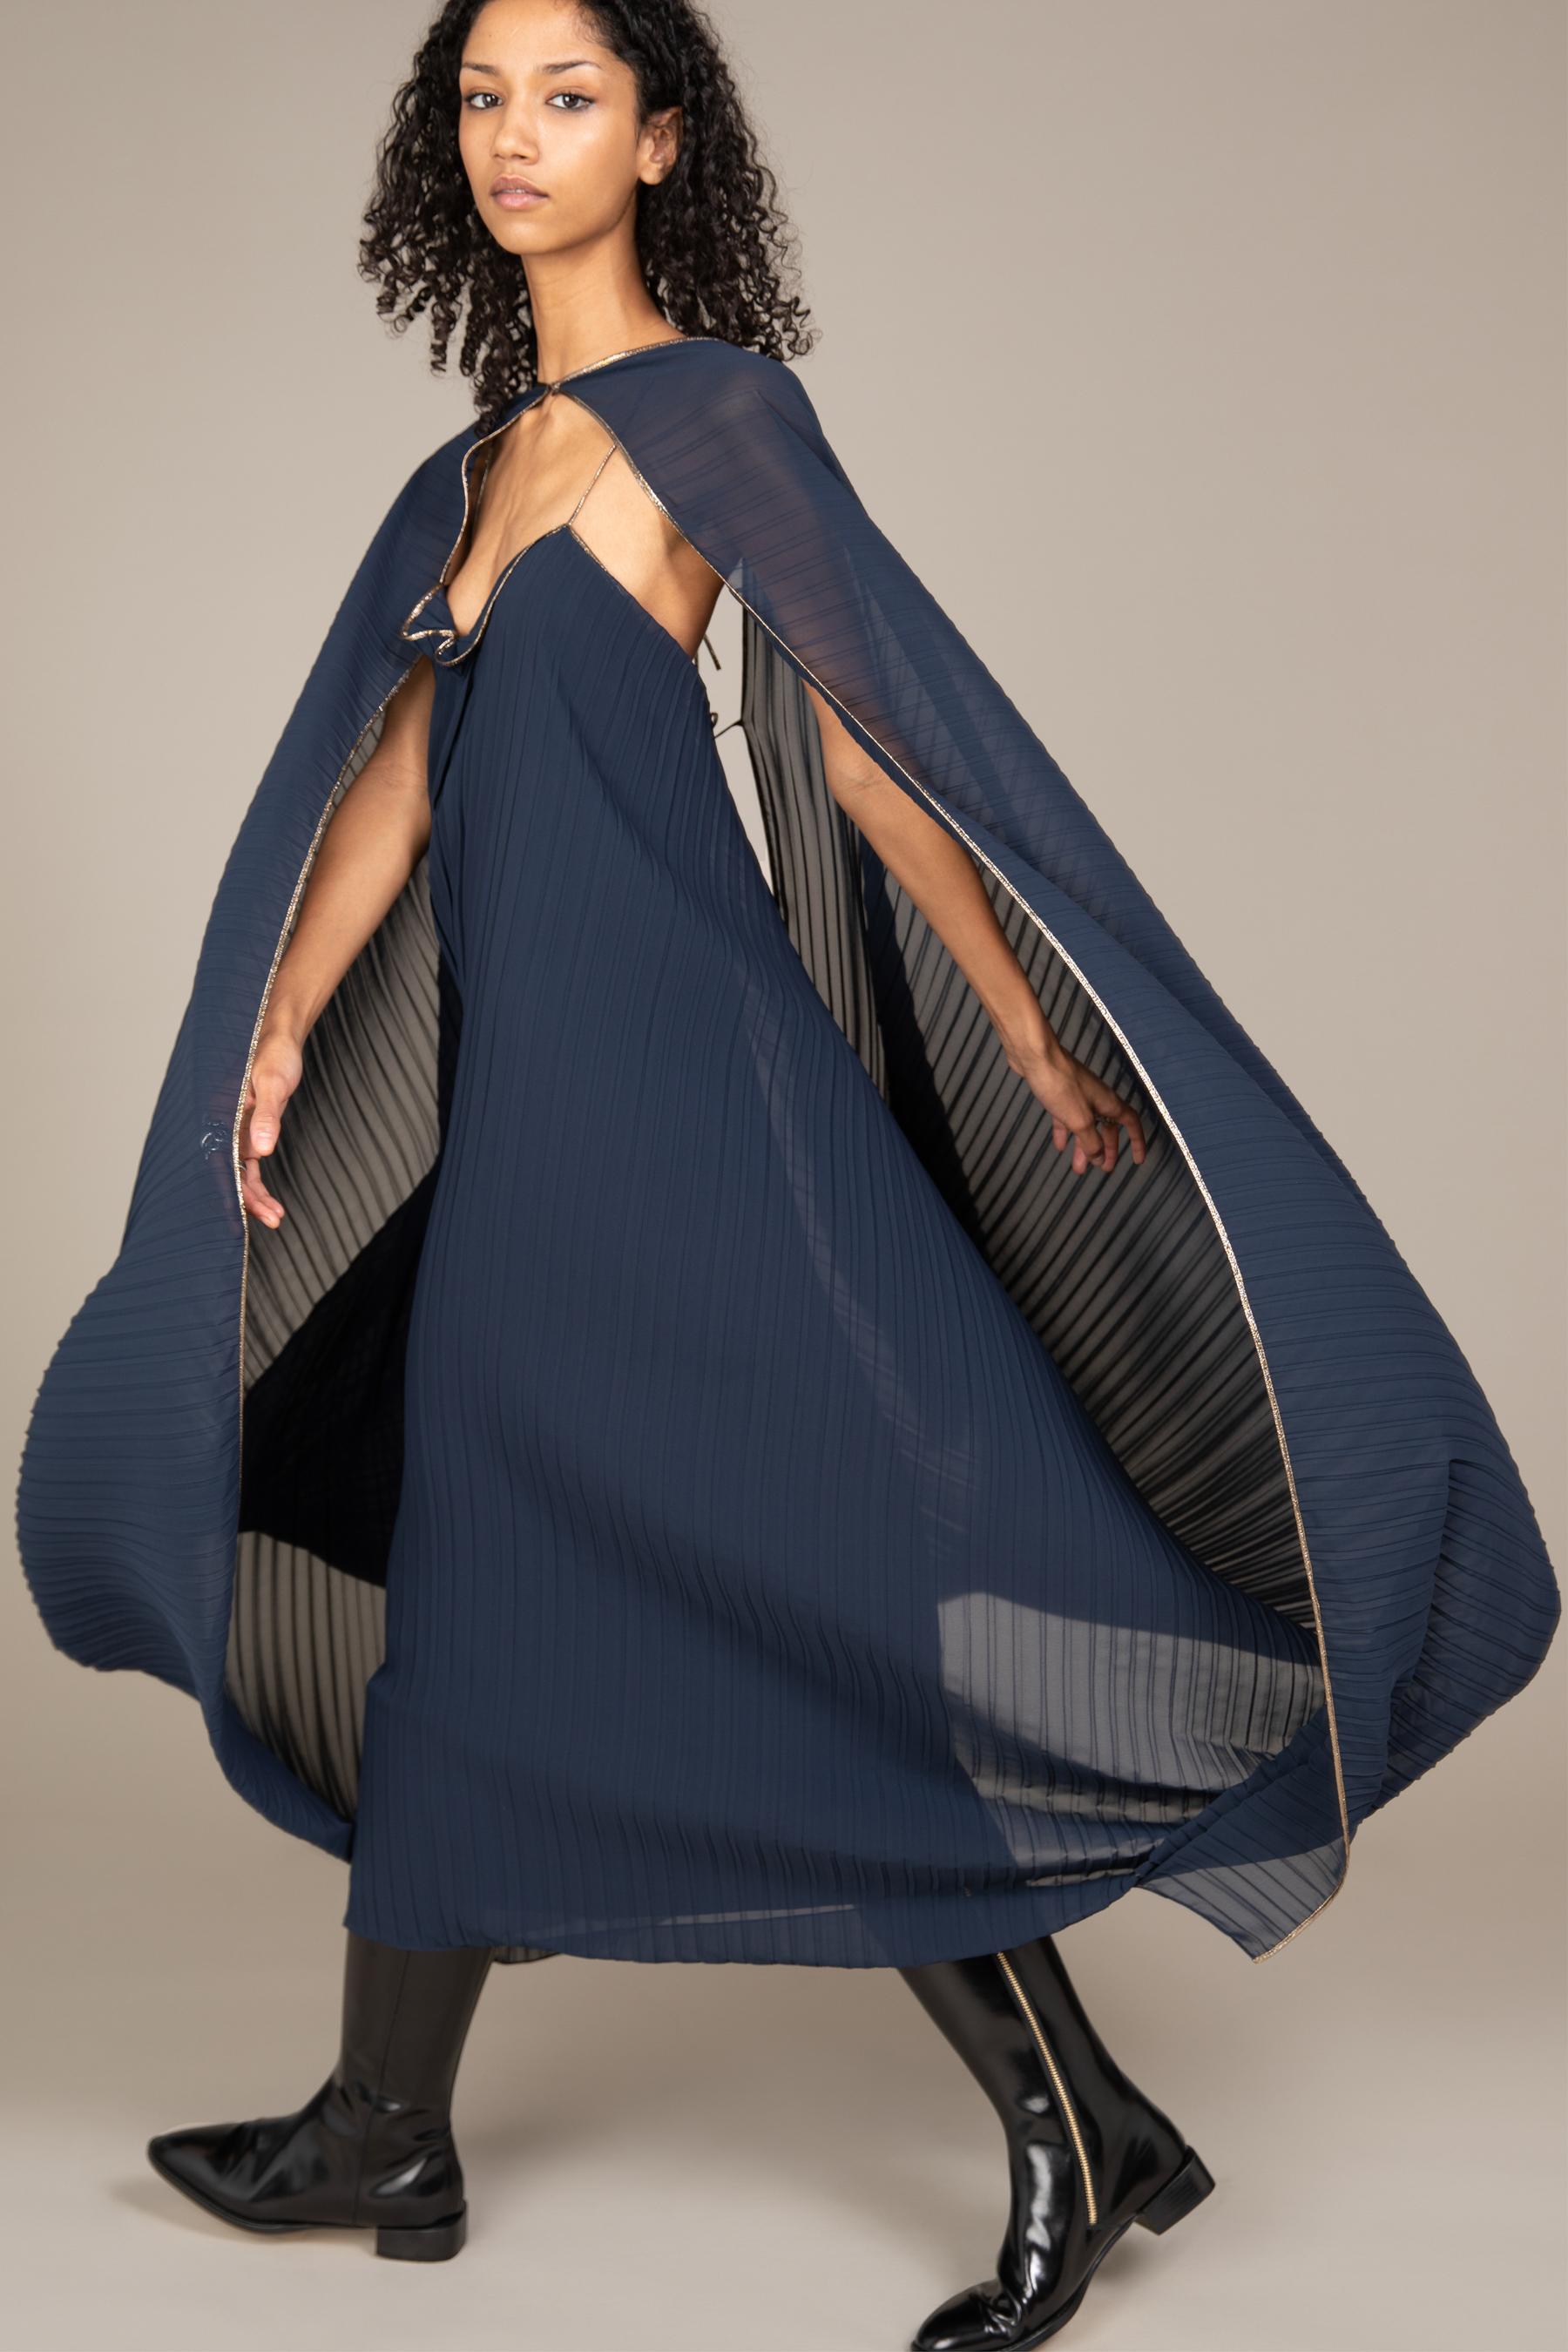 Roland Mouret Fall 2021 Fashion Show